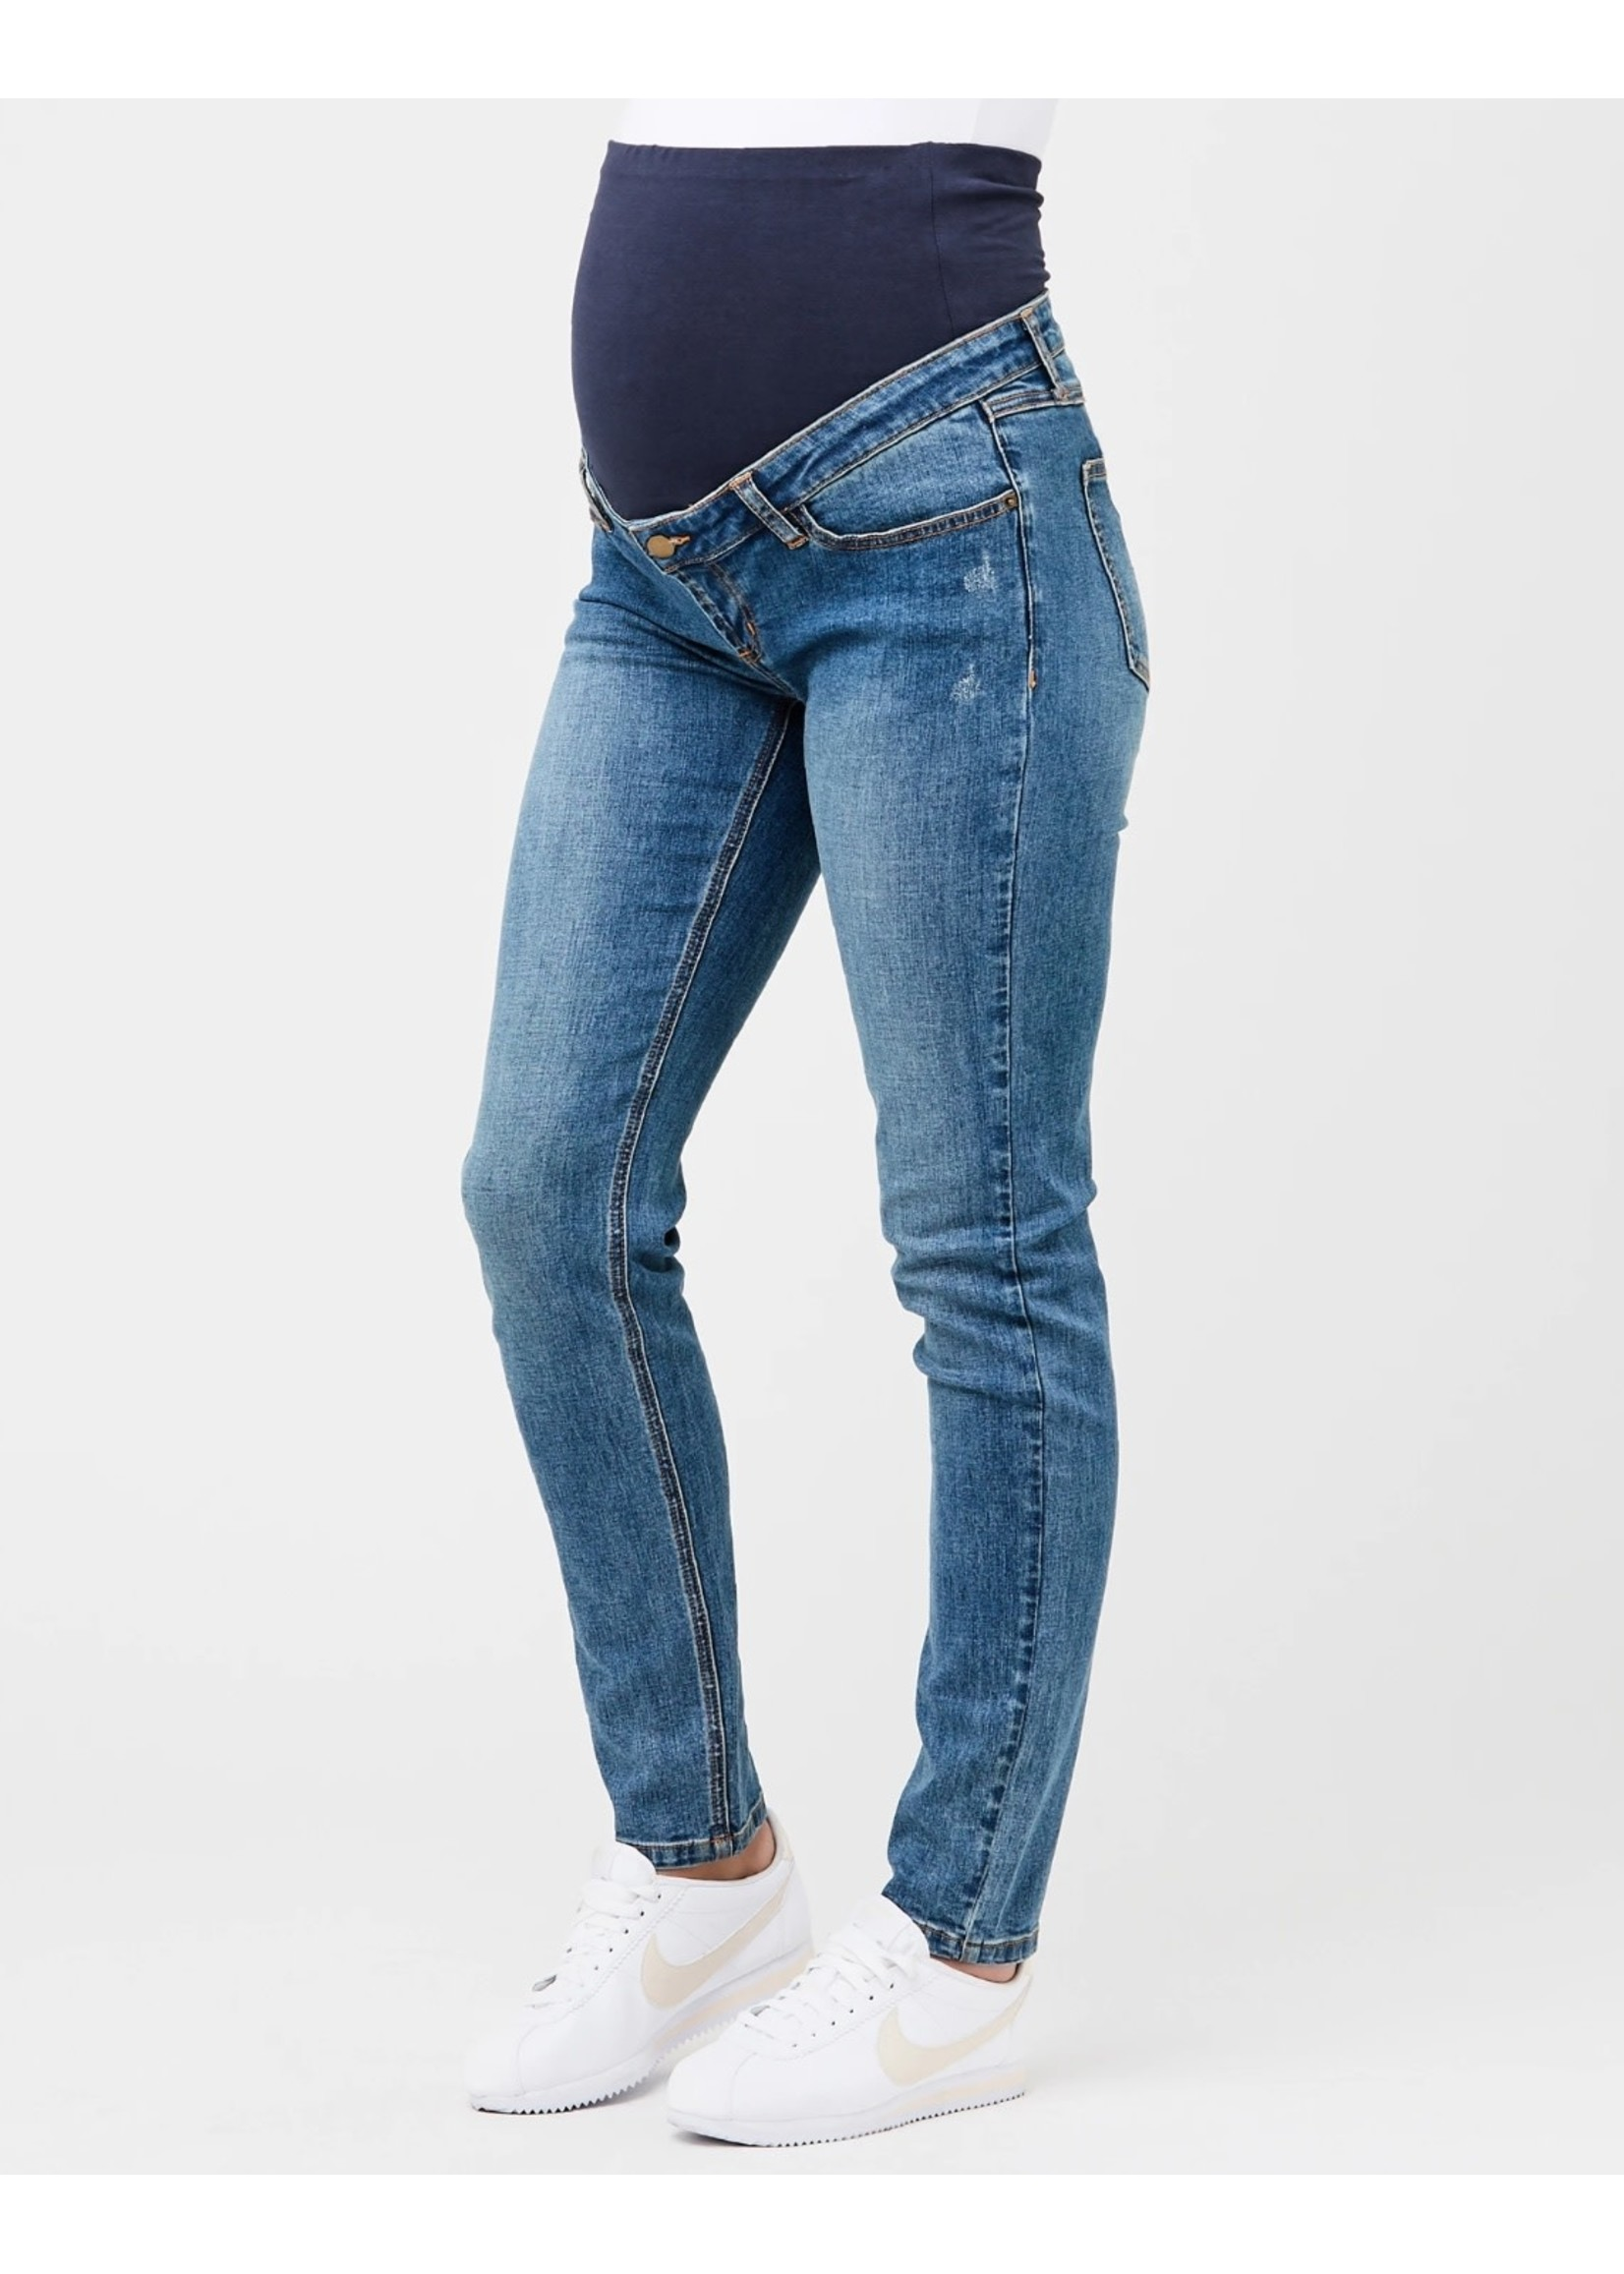 Ripe Maternity RIpe Maternity, Tyler Classic Slim Leg Jean in Blue